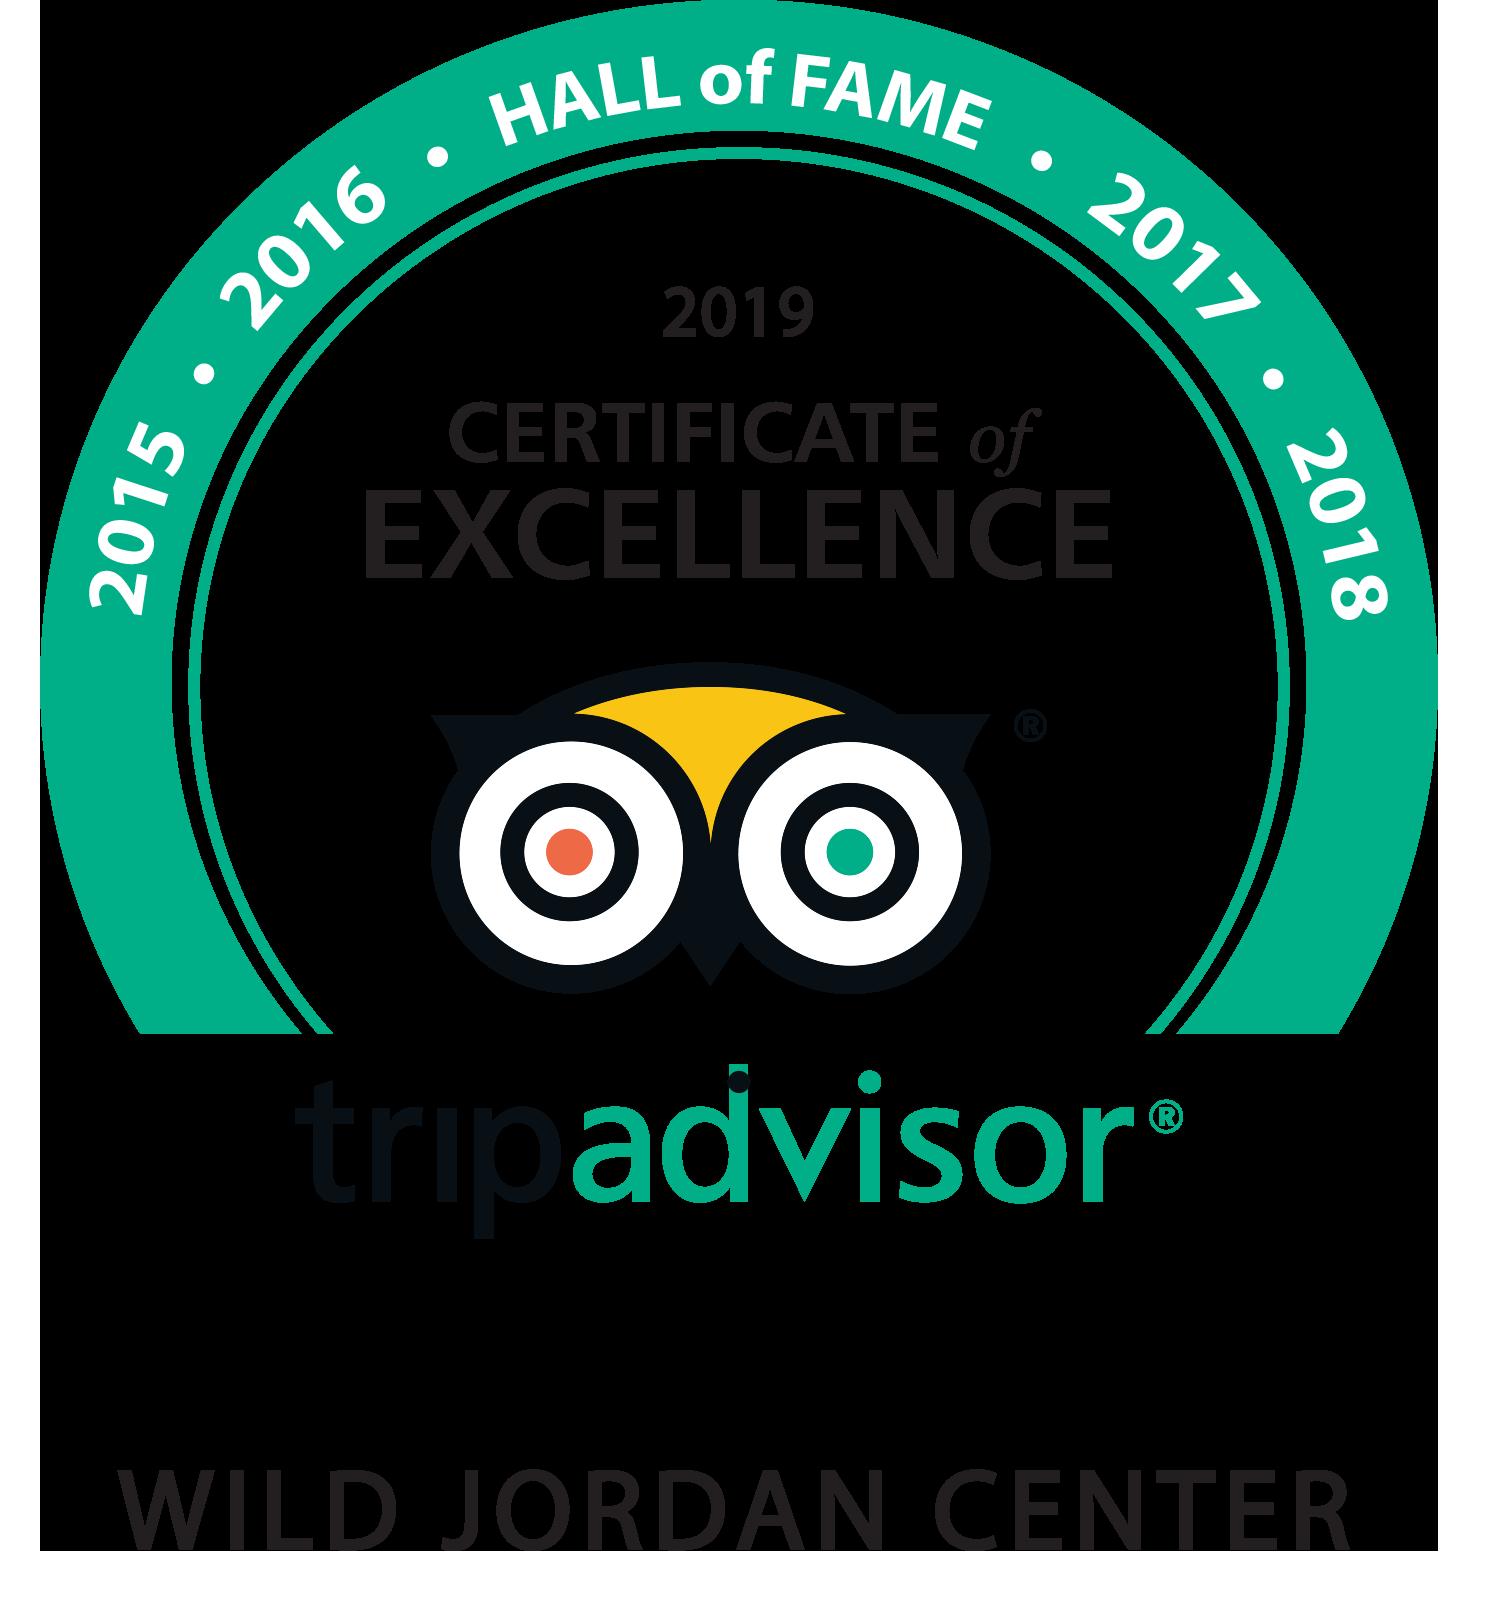 TripAdvisor-Hall-of-Fame-2019-2